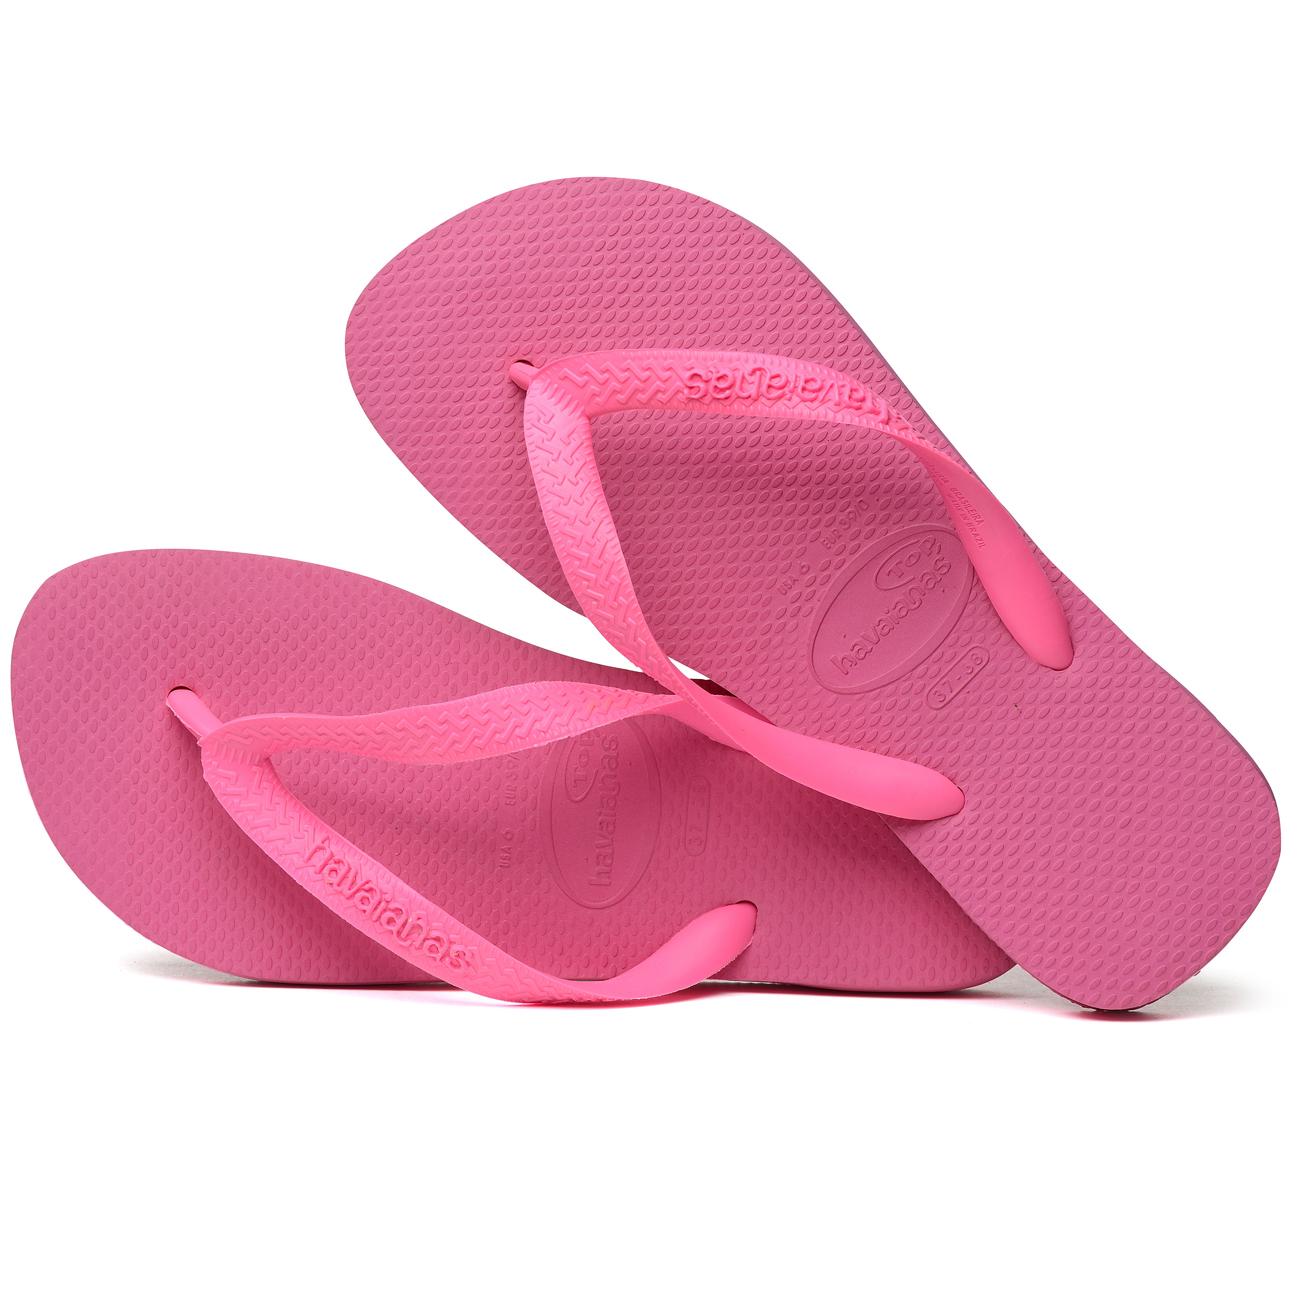 Ladies Havaianas Top Rubber Casual Slip On Sandals Brasil ...